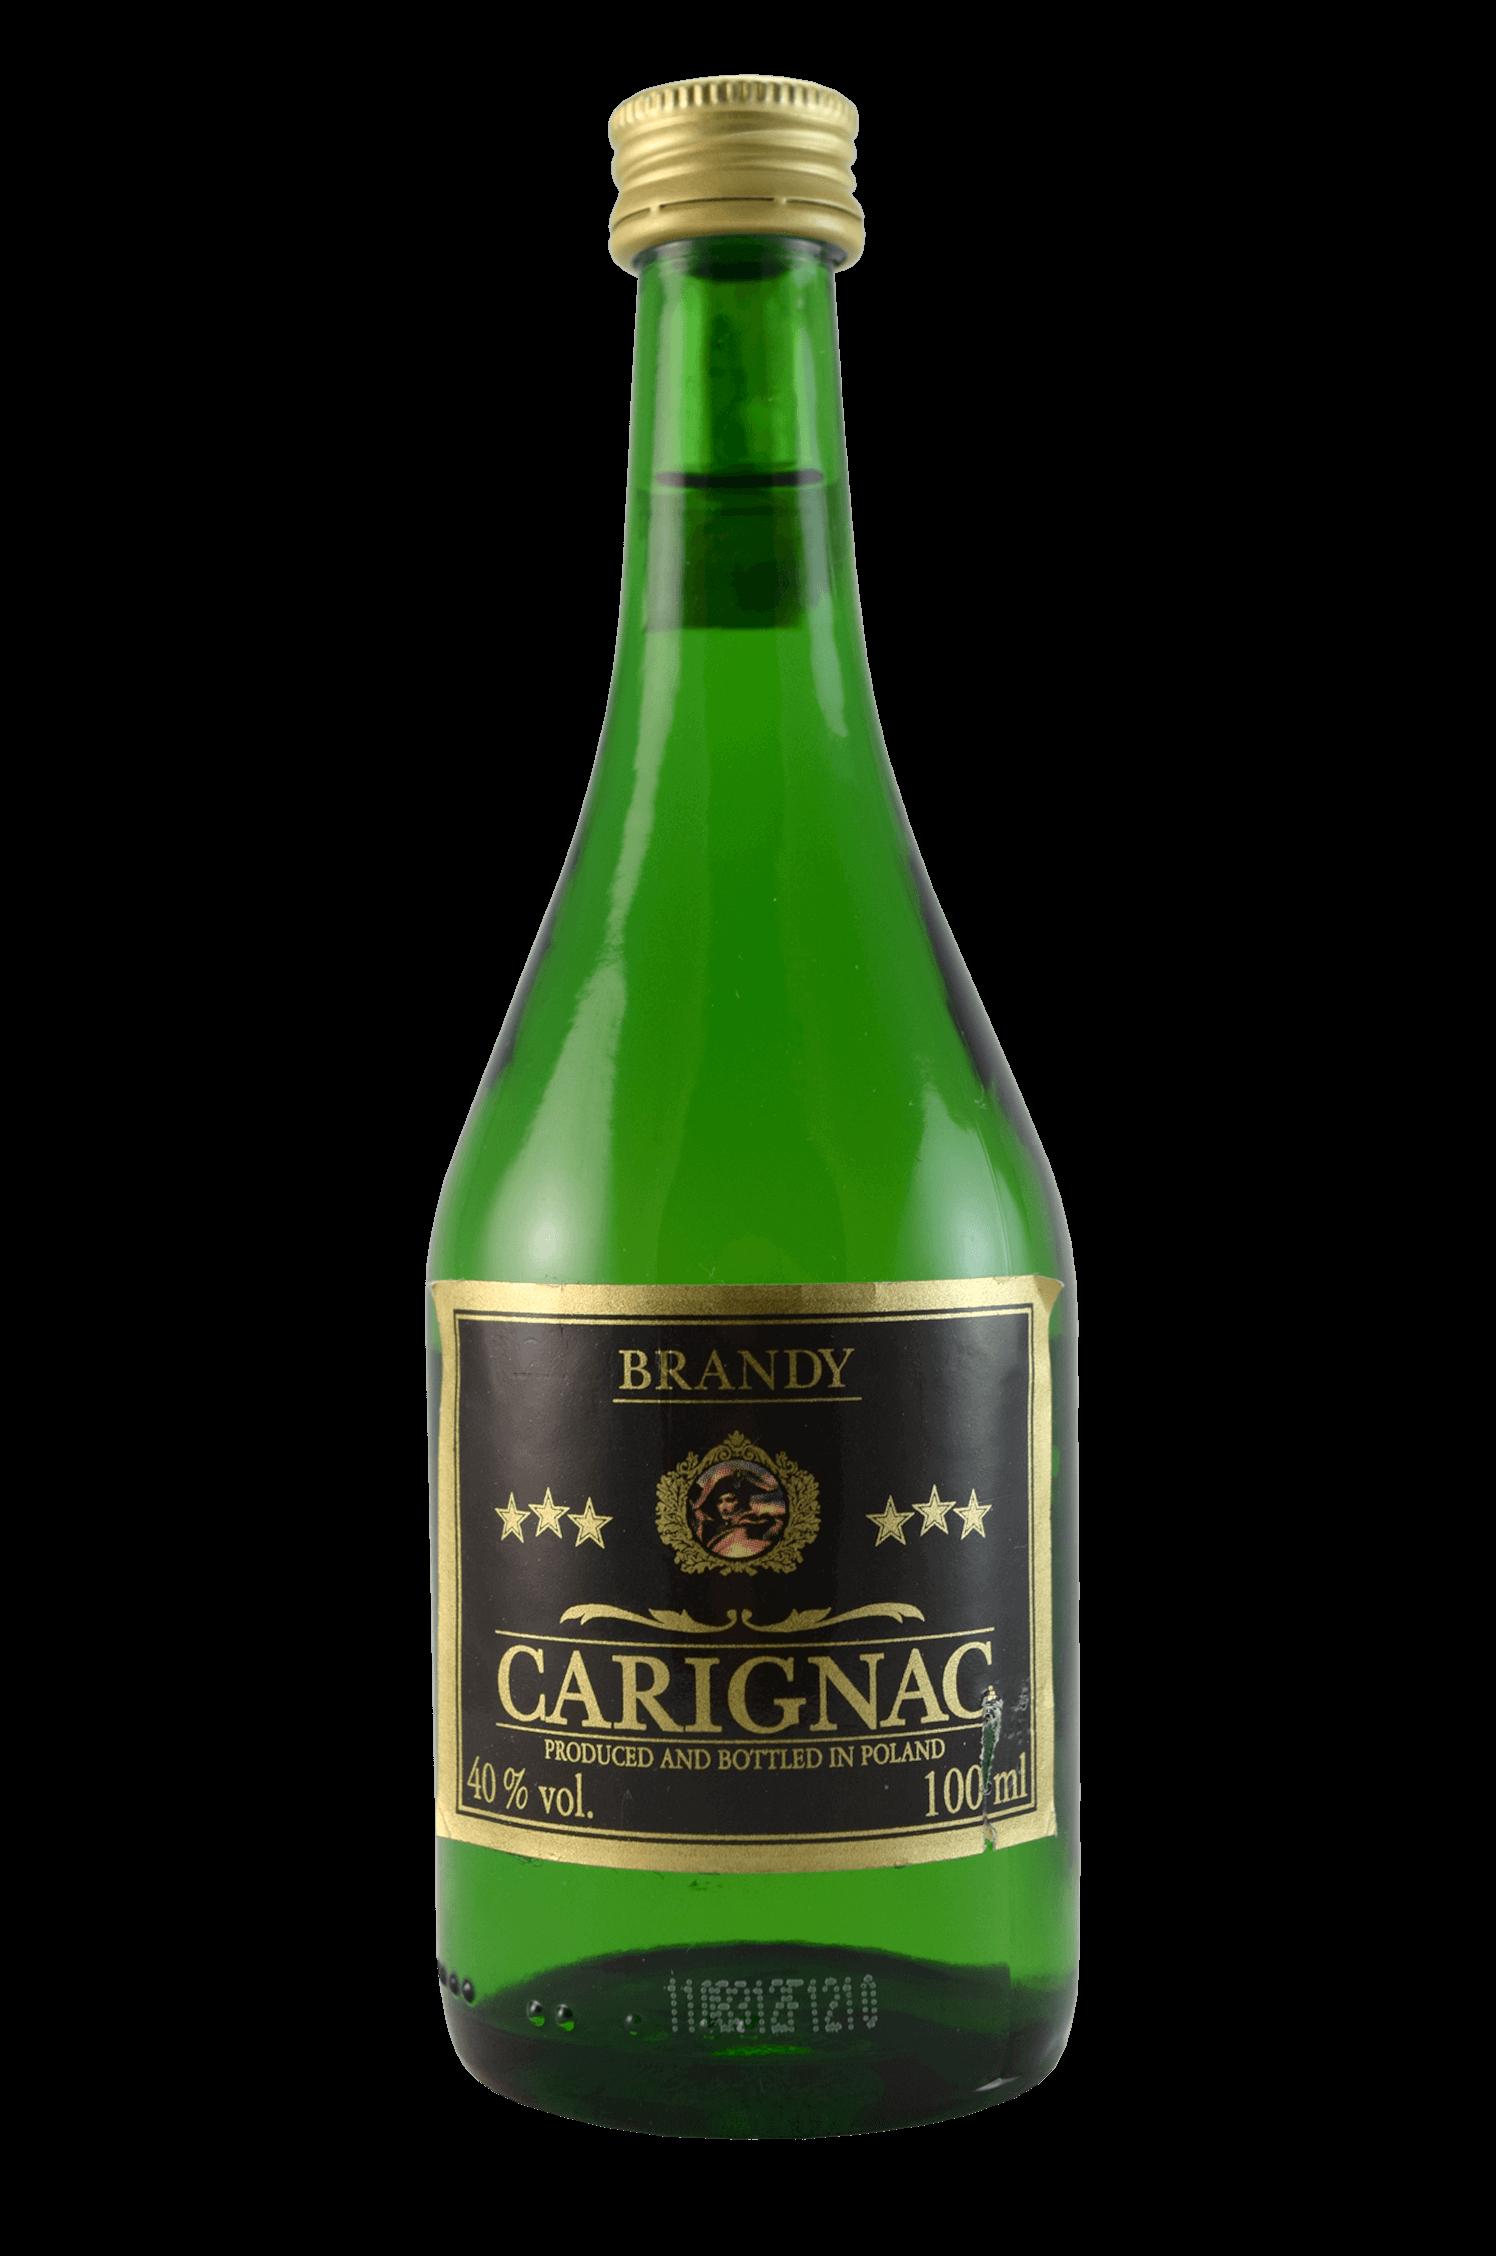 Brandy Carignac